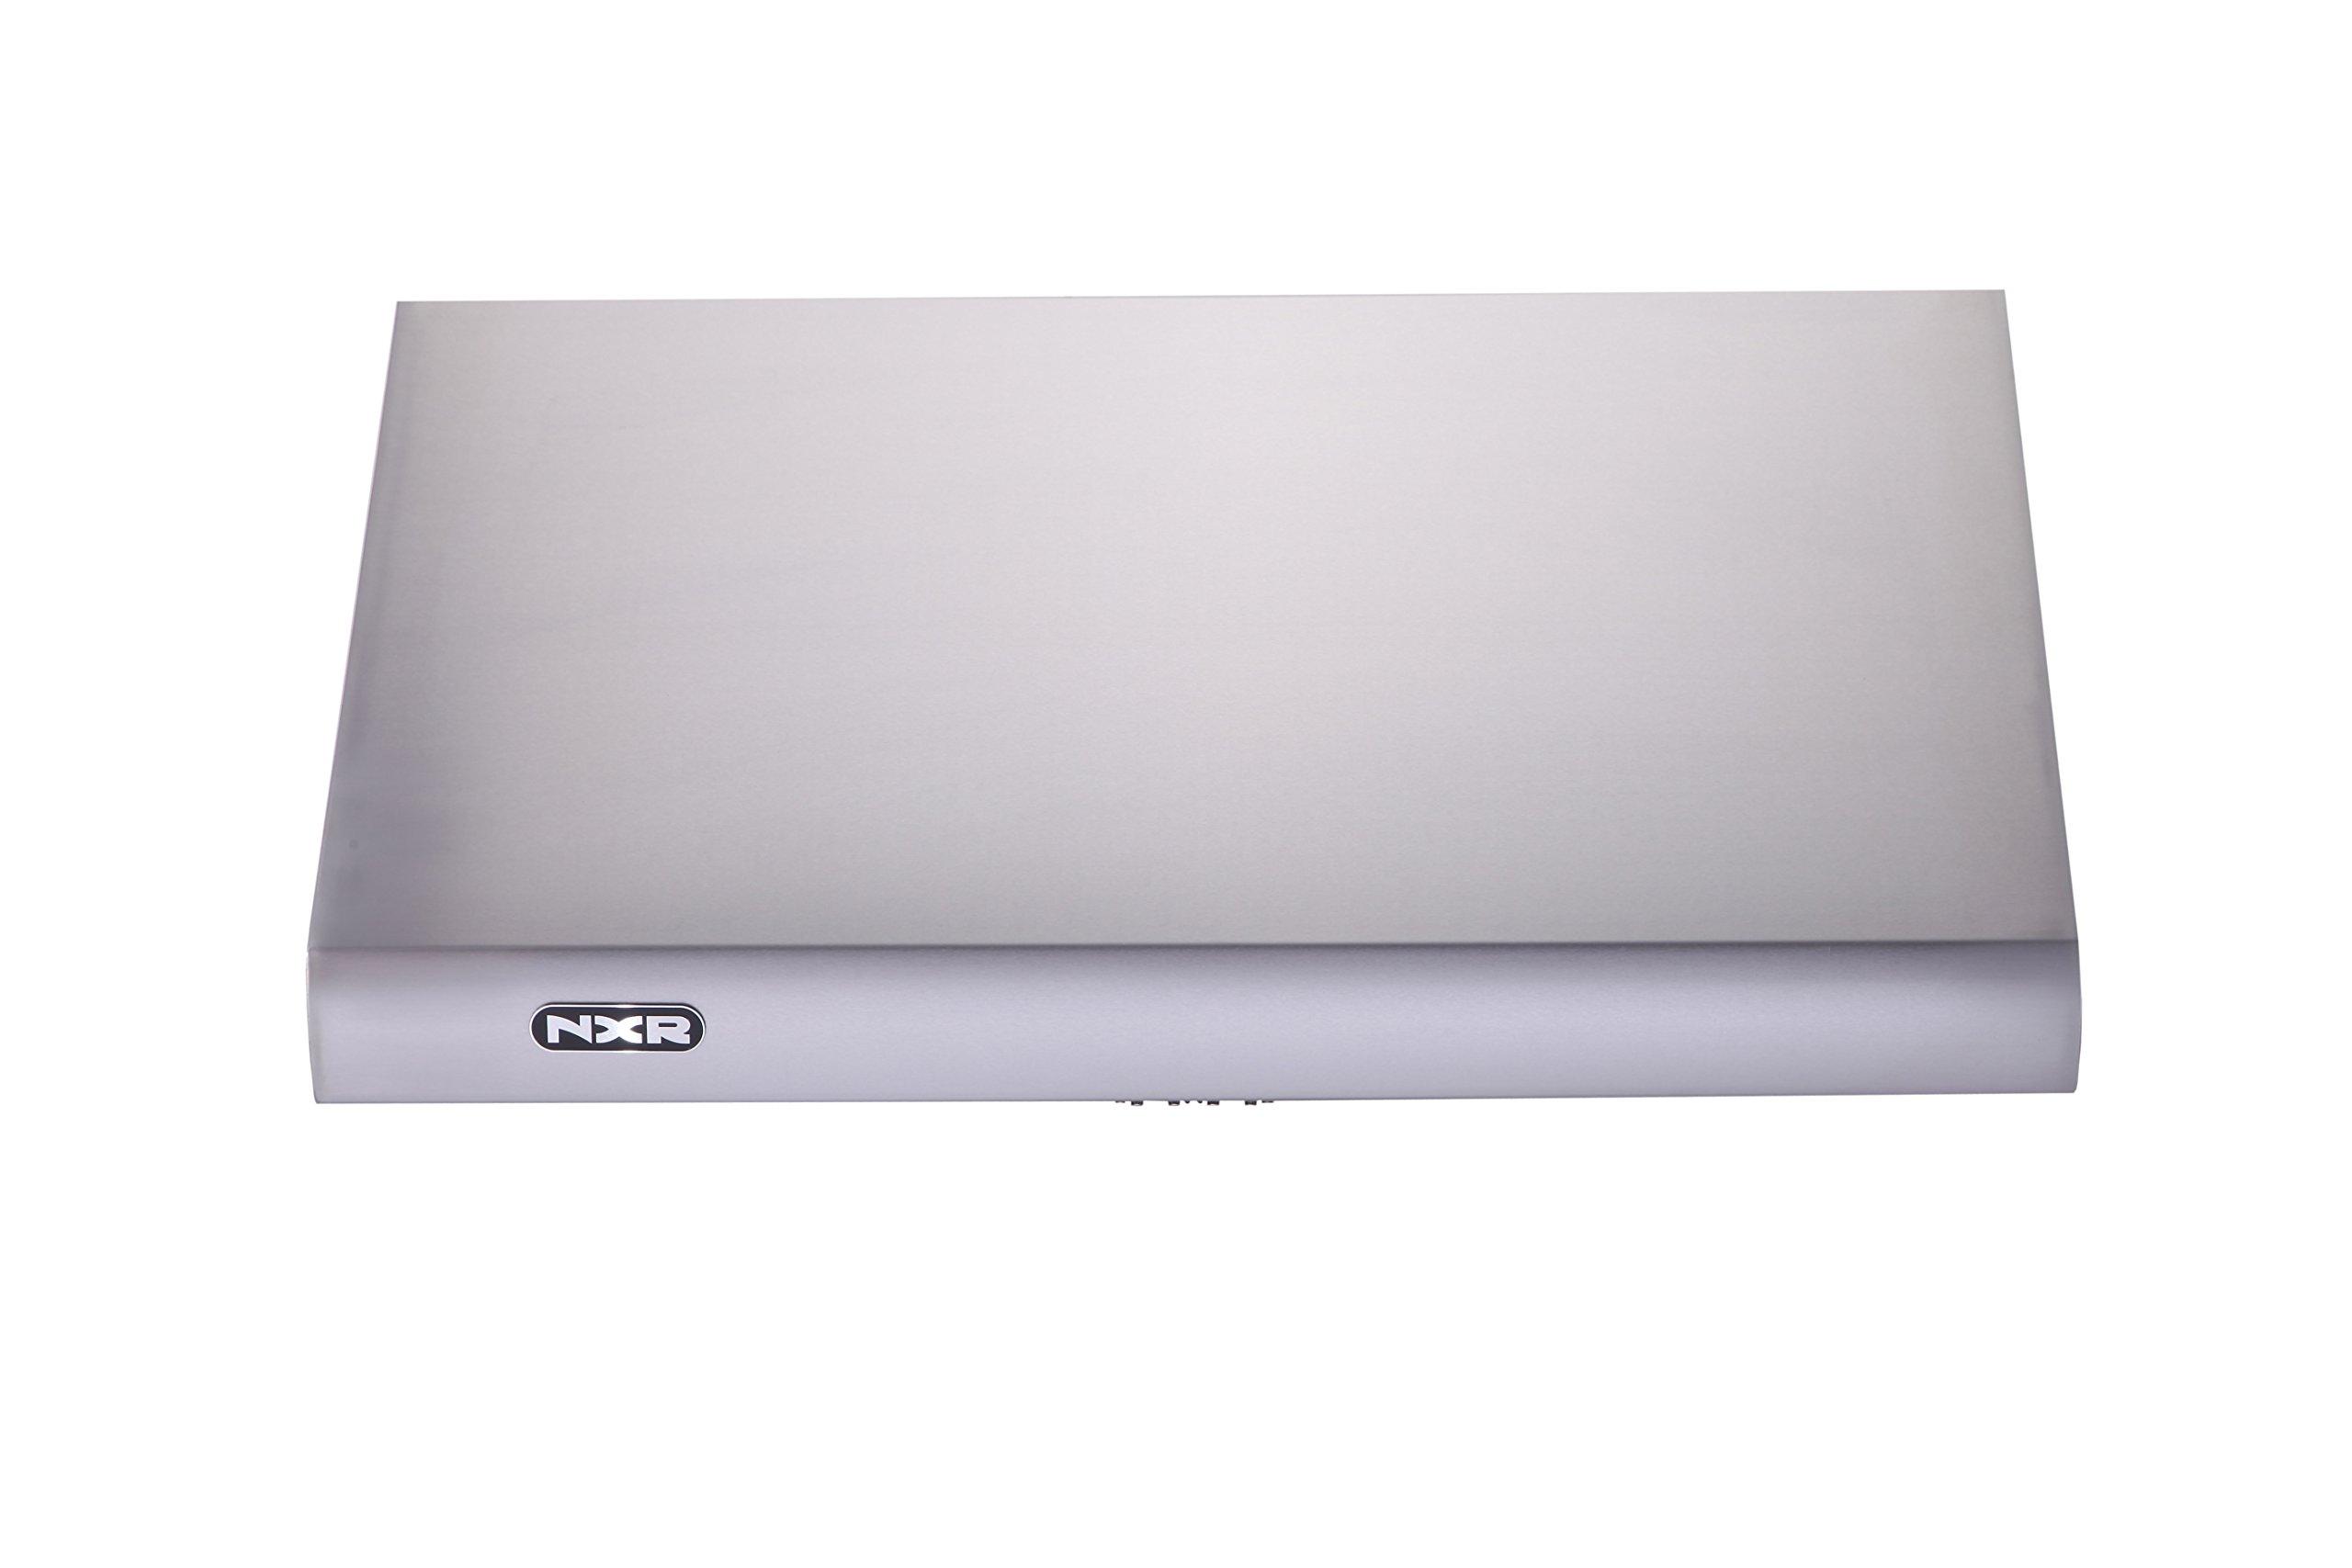 NXR NXR-RH4801 Professional Range Hood, 48'', Stainless Steel